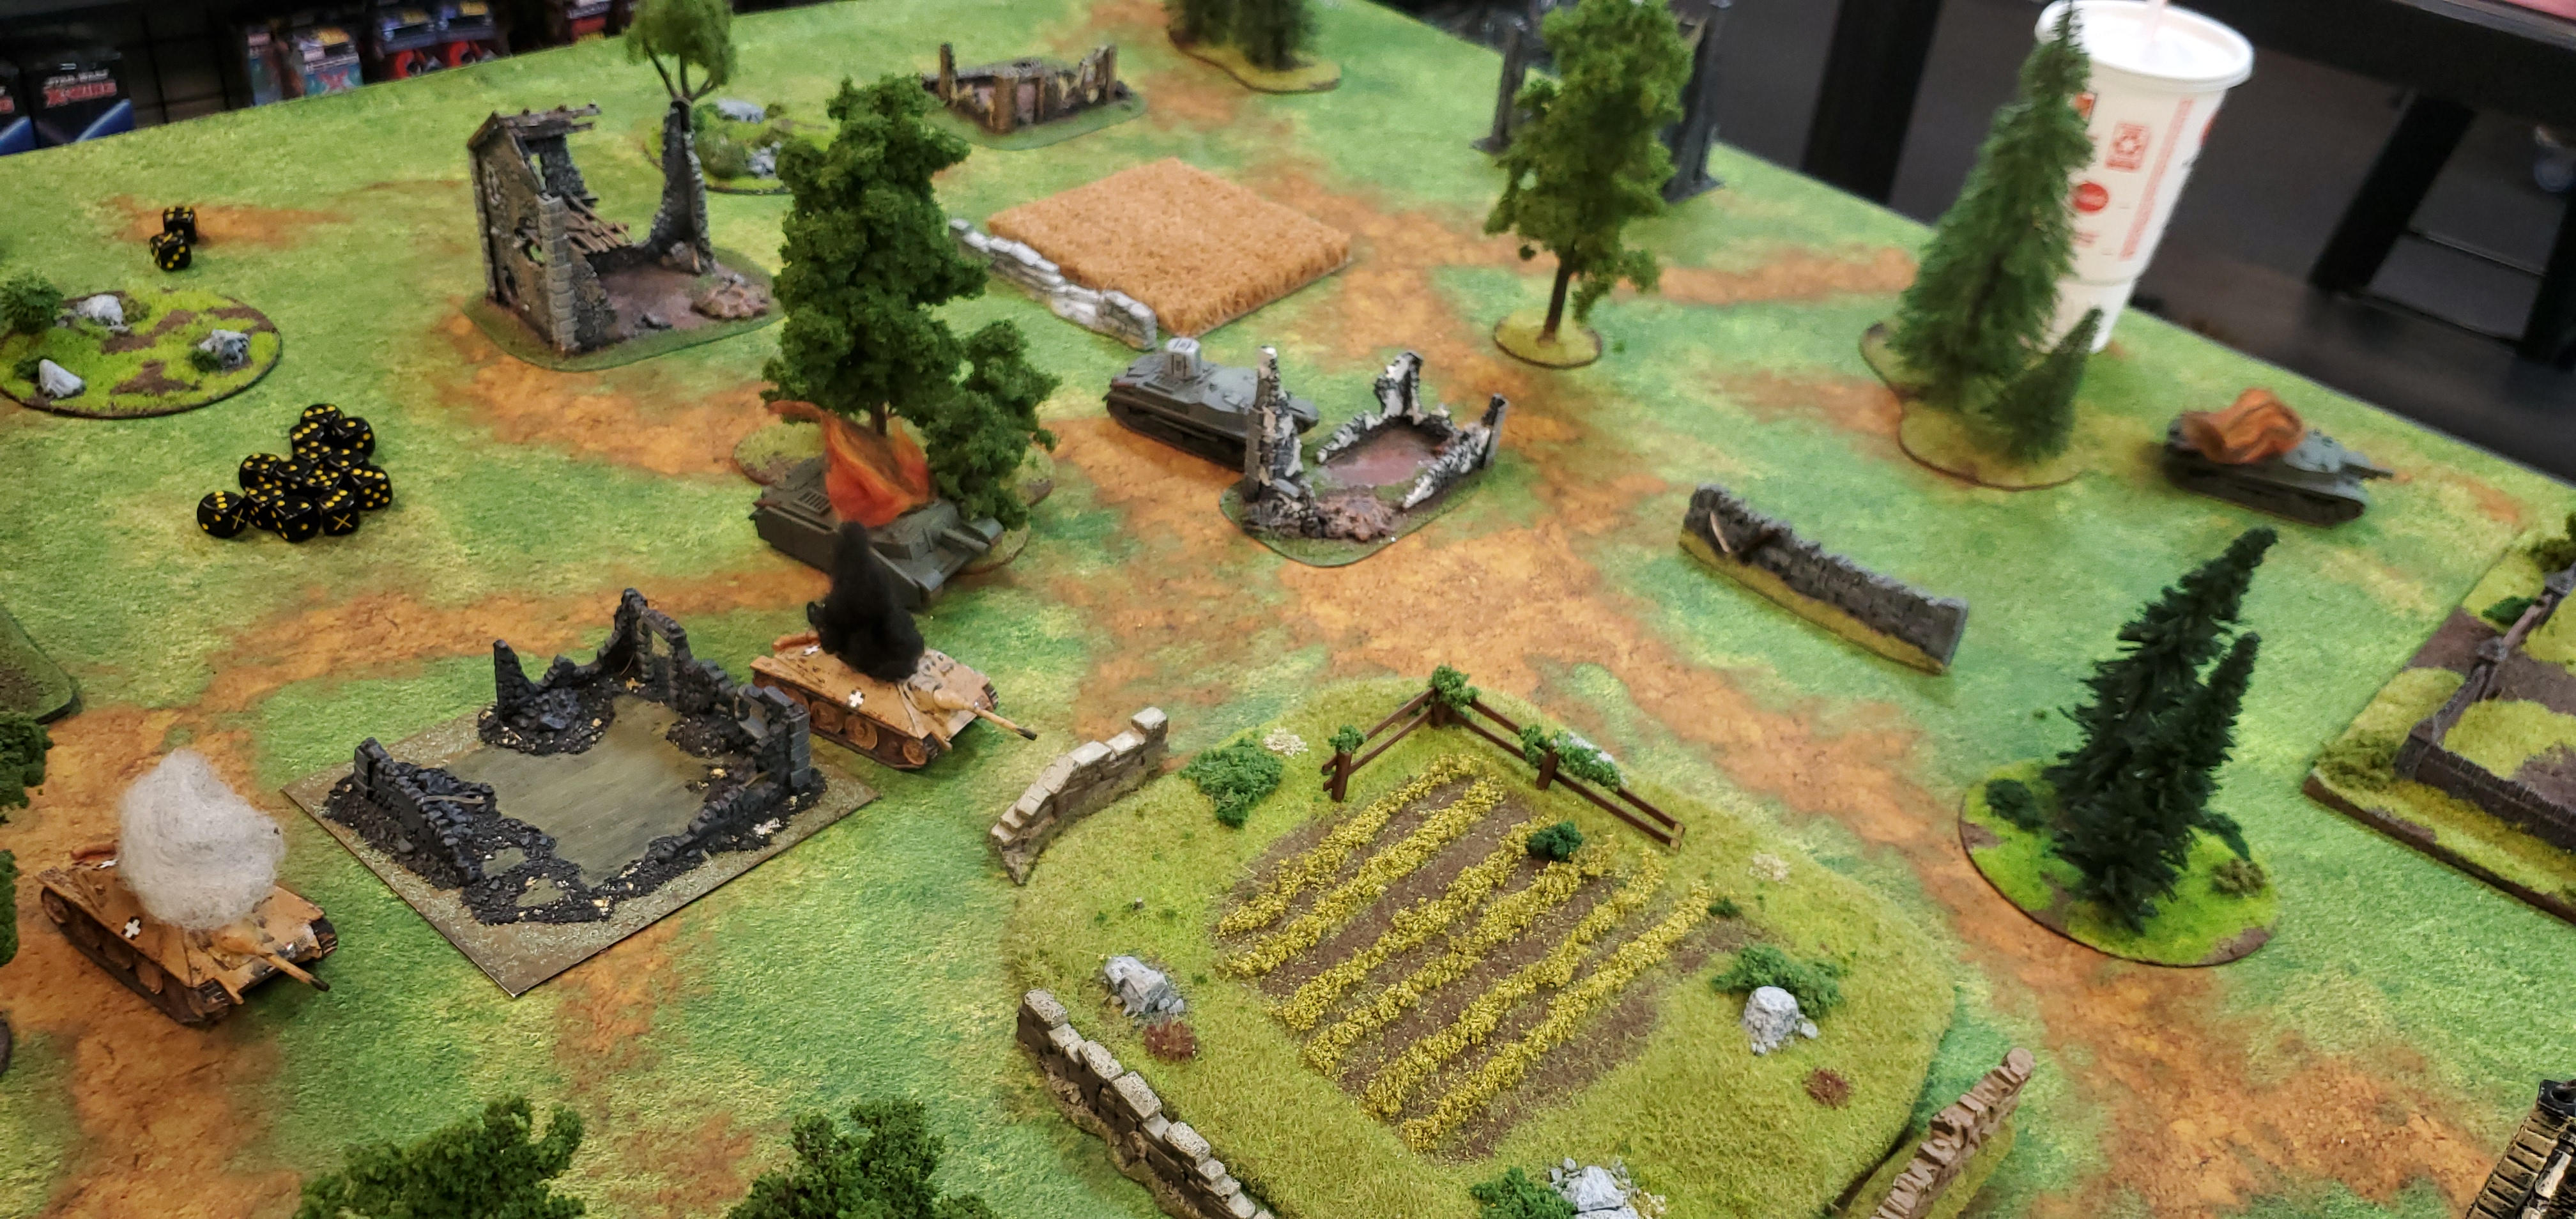 1st SS Panzer Division Leibstandarte SS Adolf Hitler versus Irish Rangers in an armoured engagement